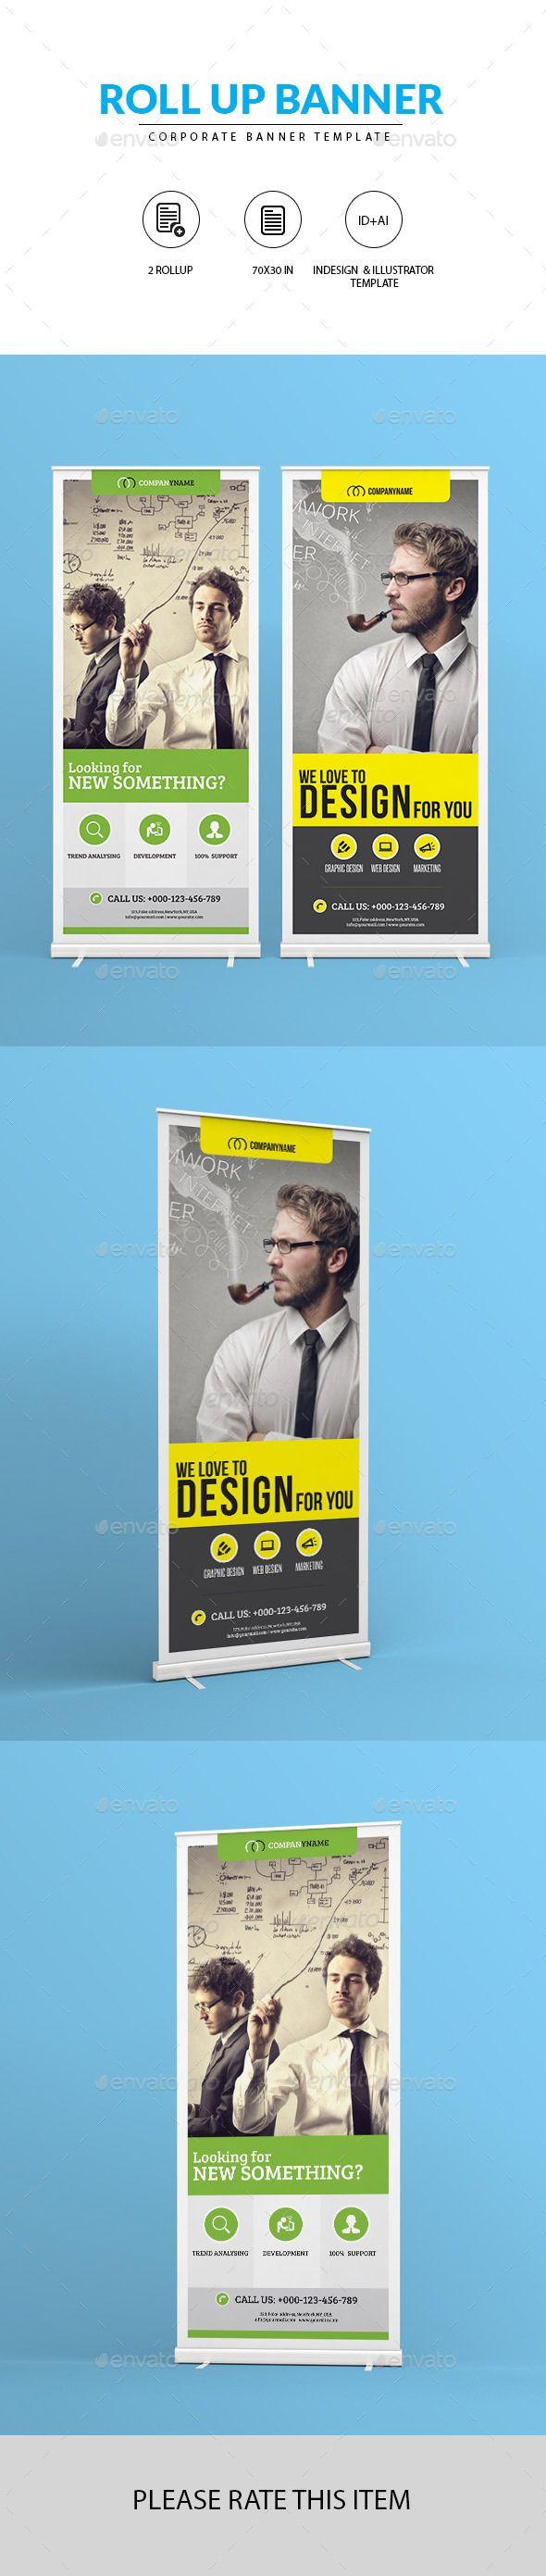 Design large banner in illustrator - Corporate Roll Up Banner